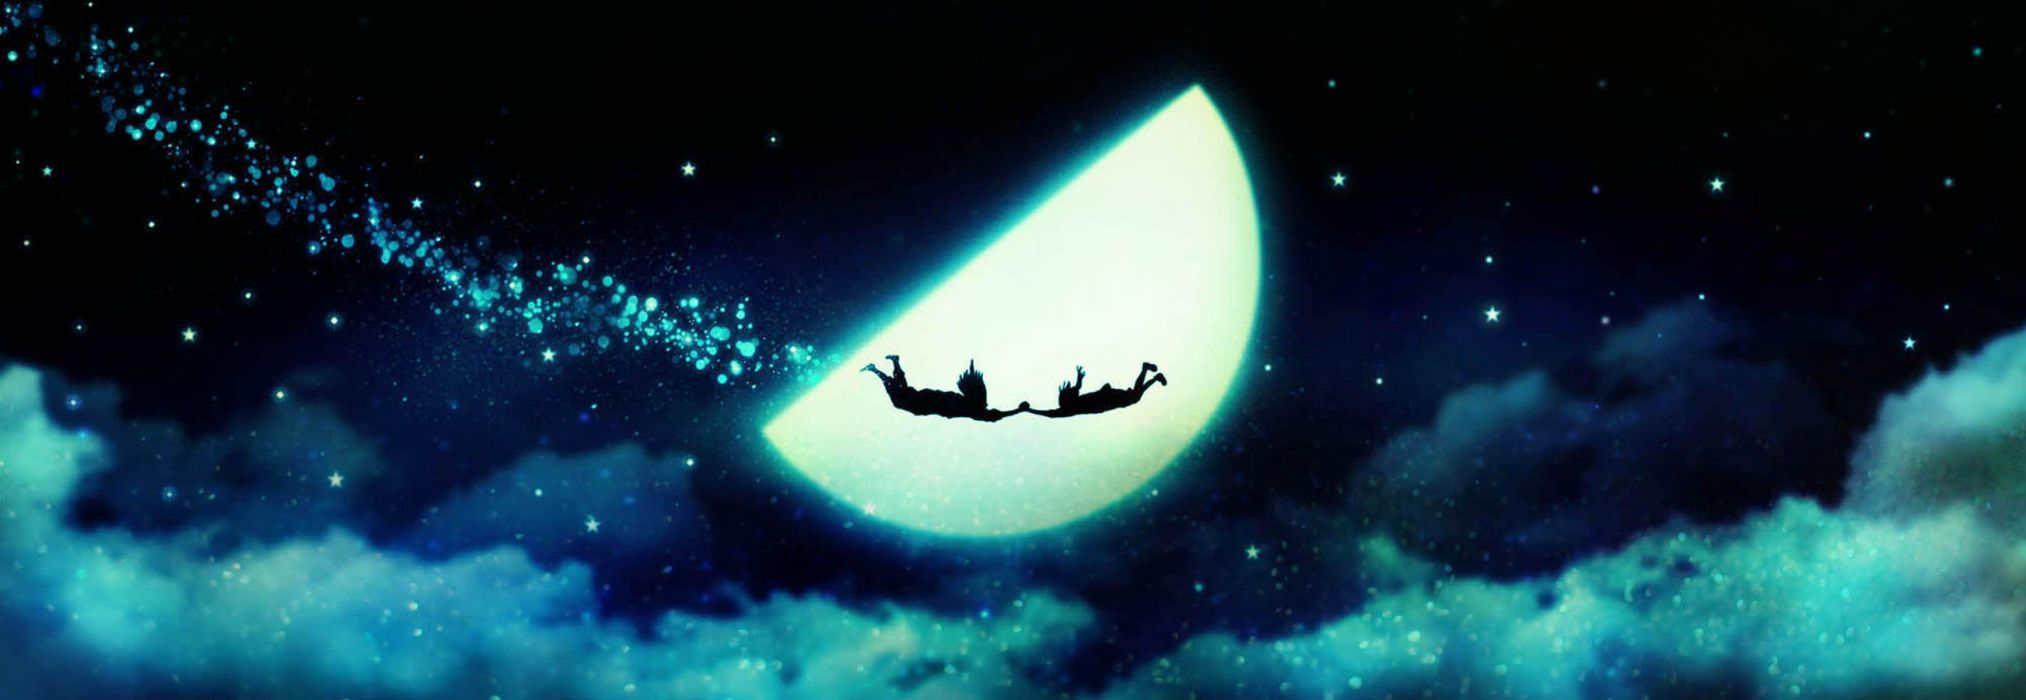 original anime moon magic fly sky star cloud wallpaper